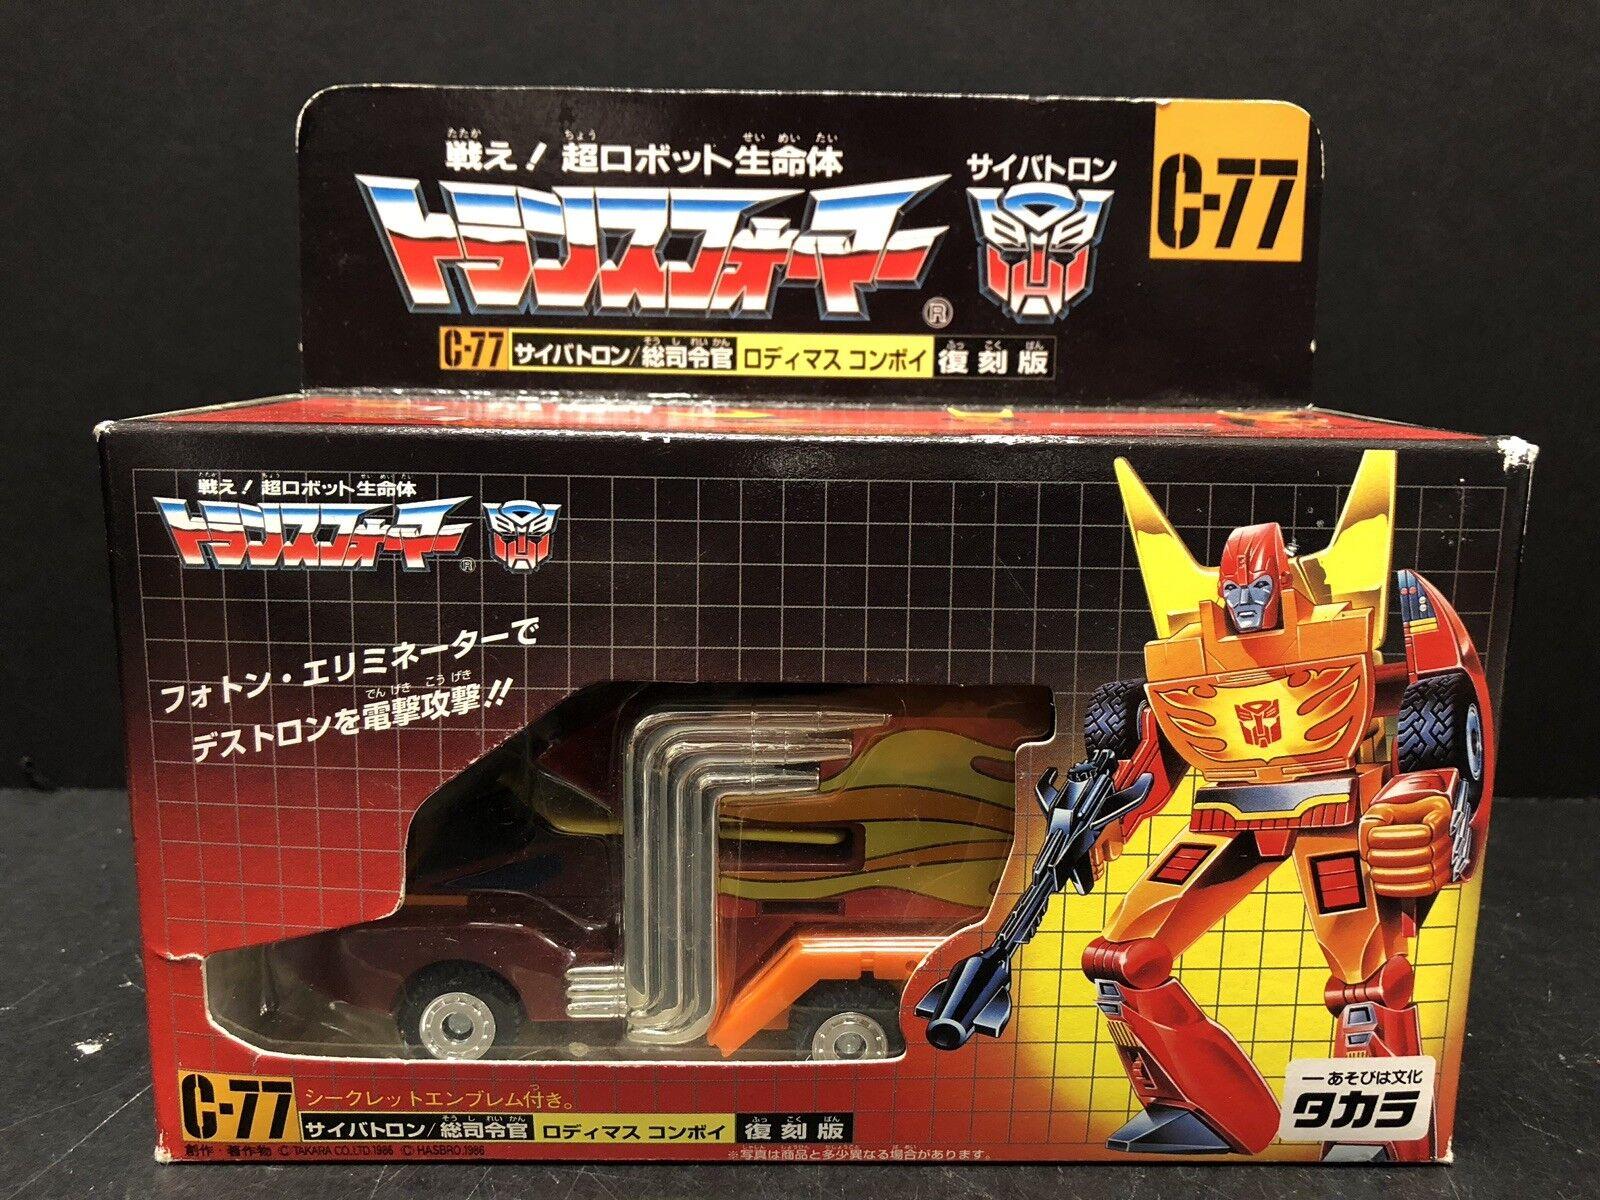 Takara Transformers Reissue C-77 Rodimus Prime ATL1053